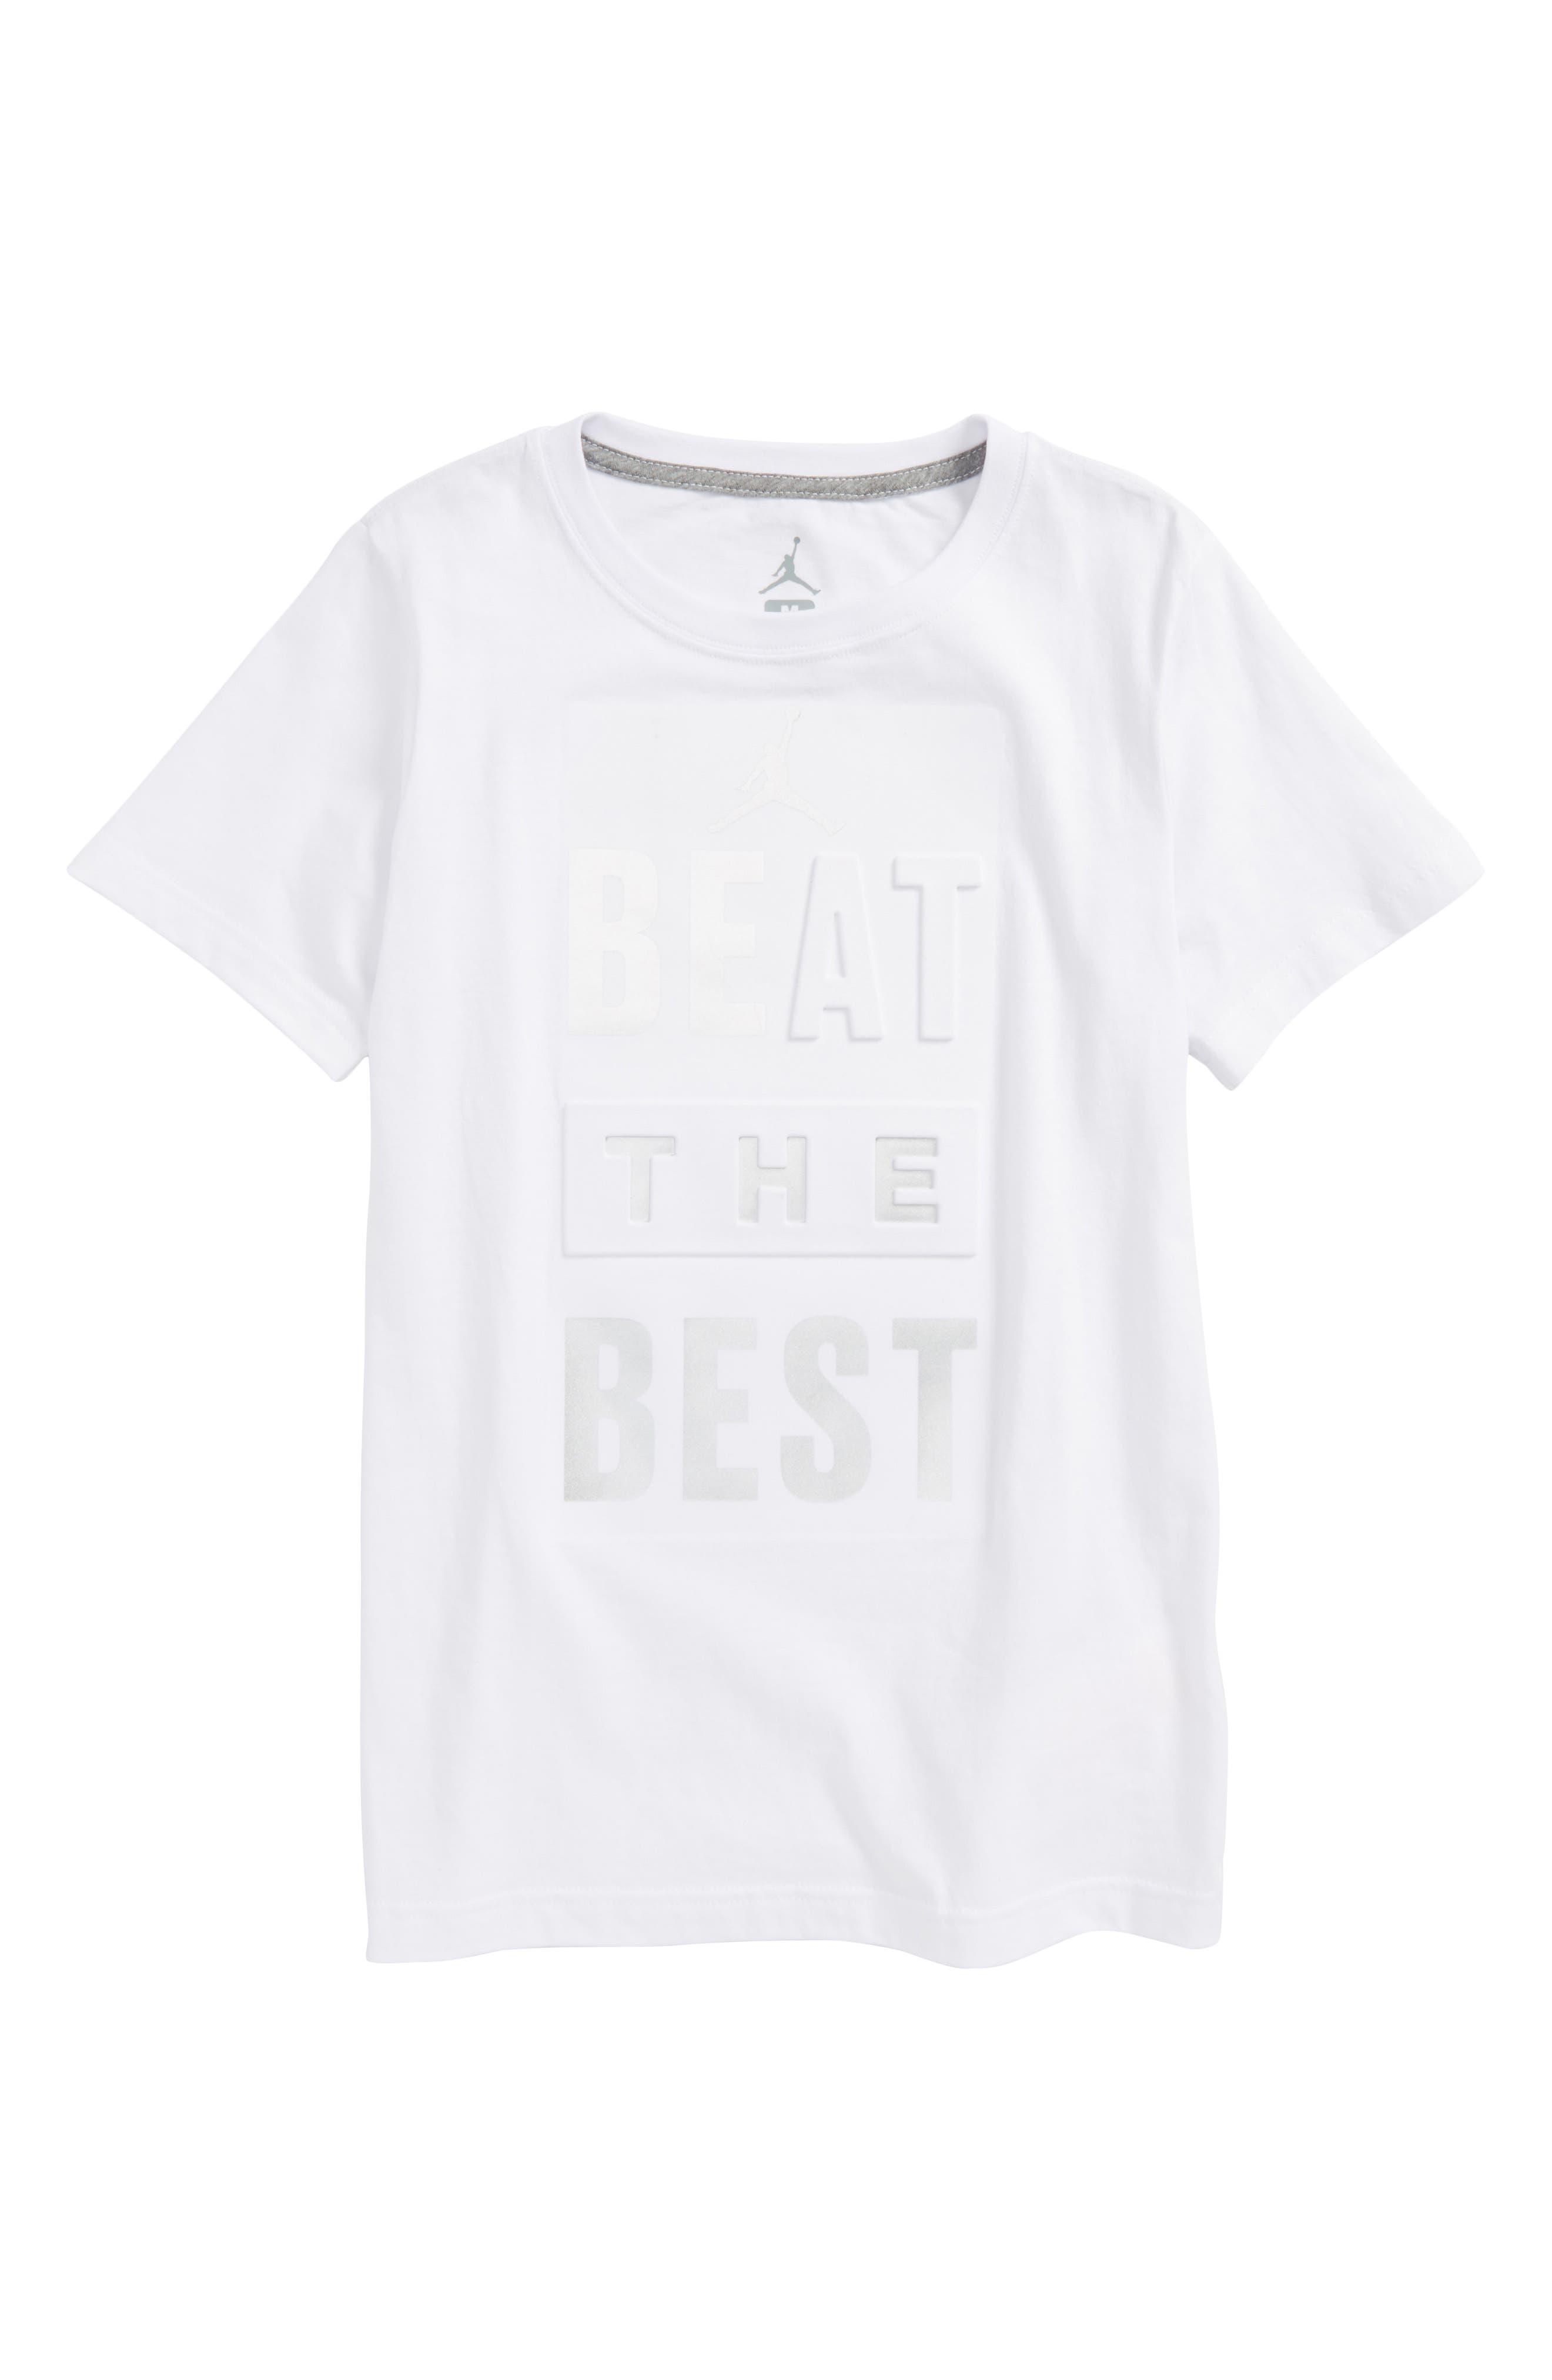 Jordan Beat the Best Graphic T-Shirt,                             Main thumbnail 1, color,                             White